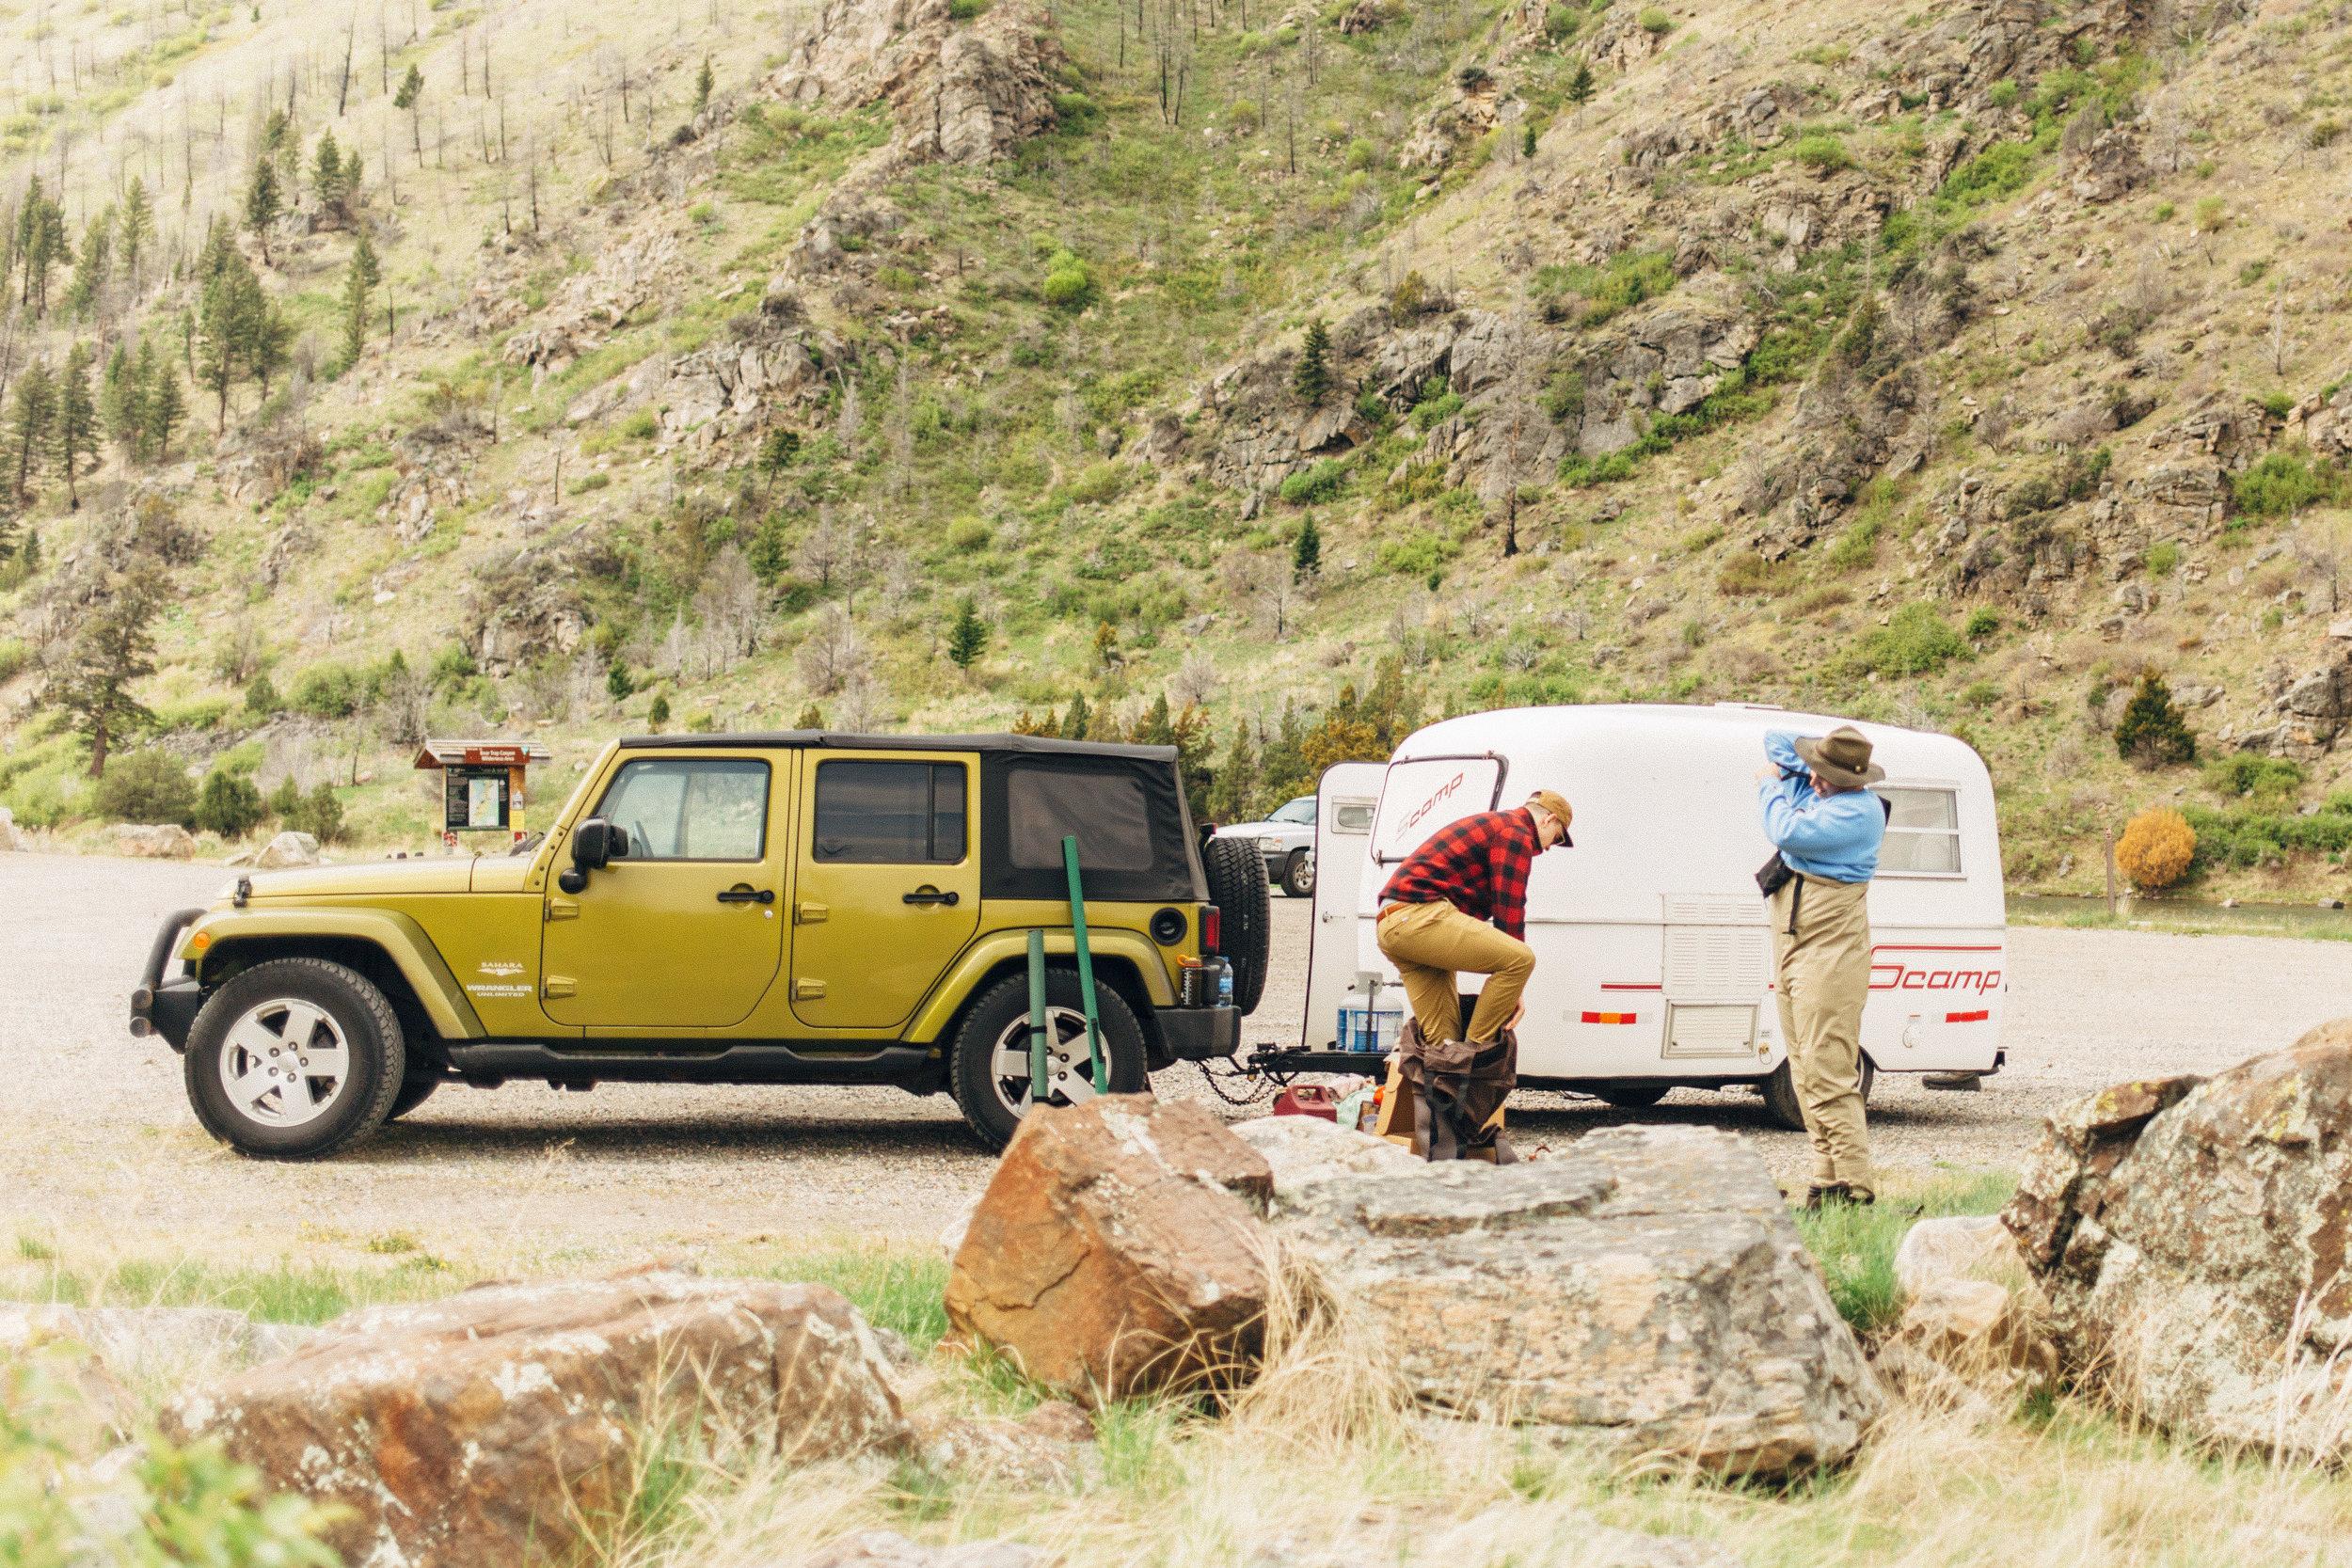 NSR_HappyScamper_RoadTrip_lowres-NSR_2766.jpg